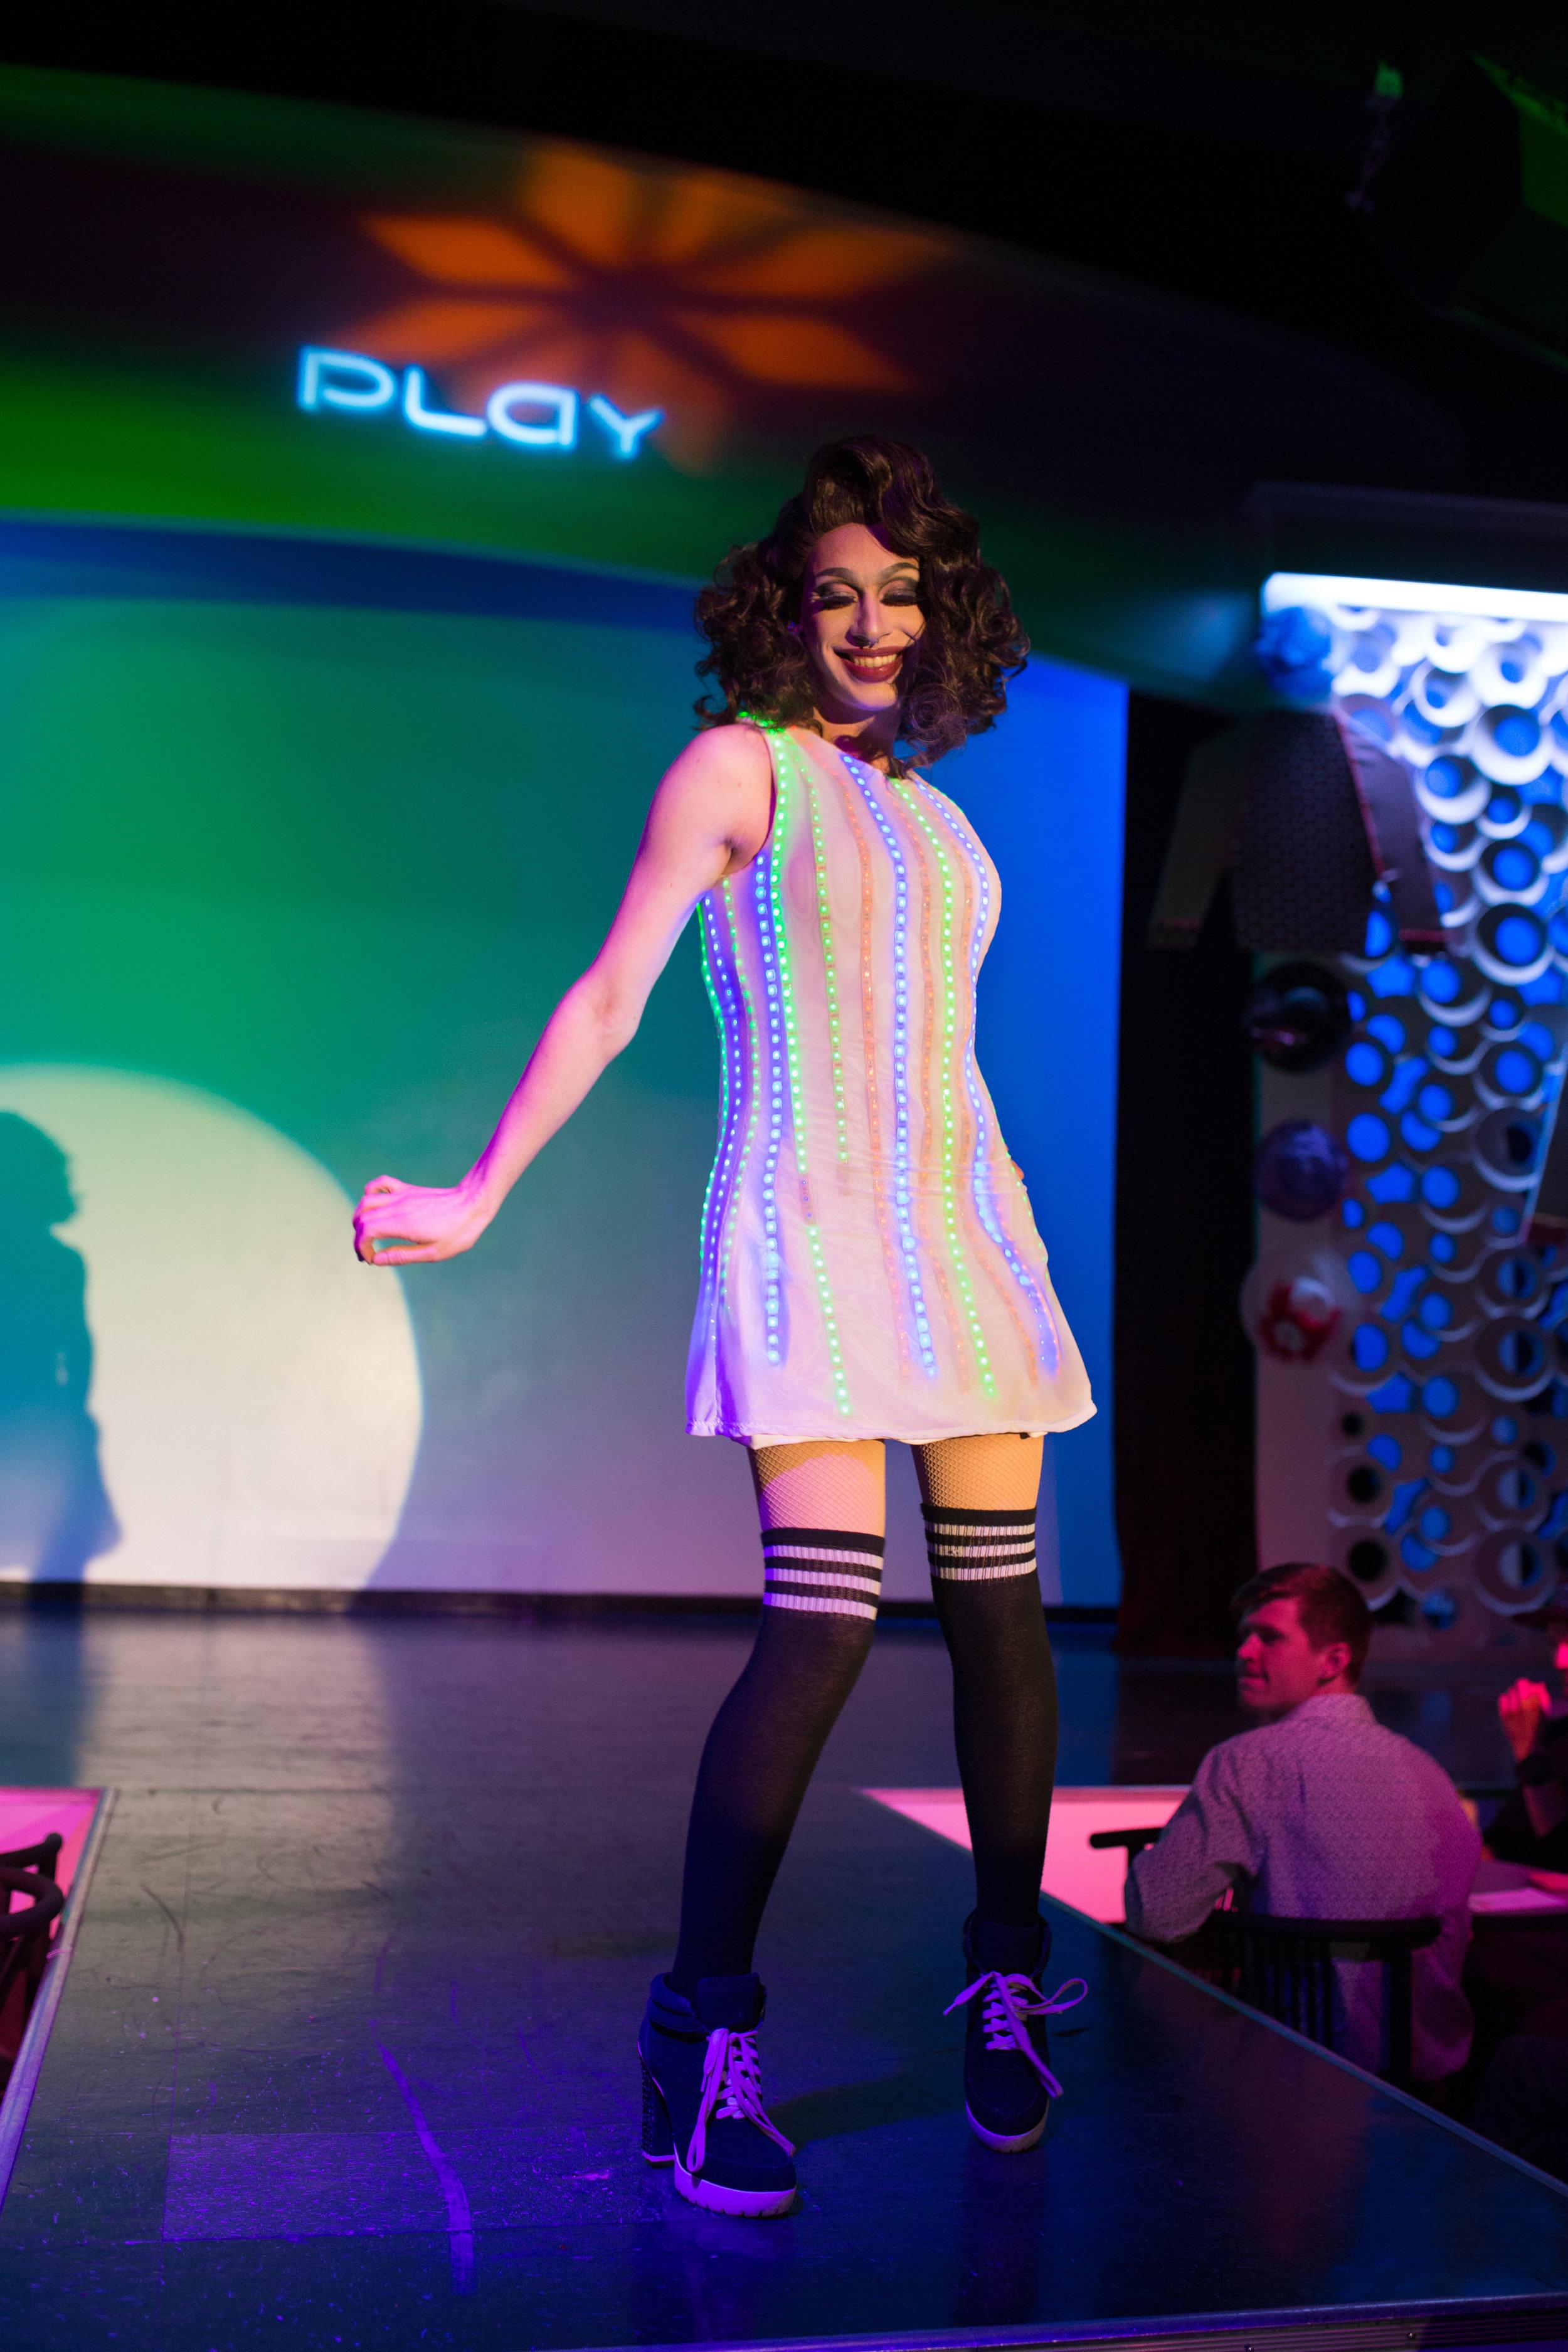 Rainbows & Roses Thurby 2017 WEBSITE FEVA PLAY Crystal Ludwick Photo 70.jpg